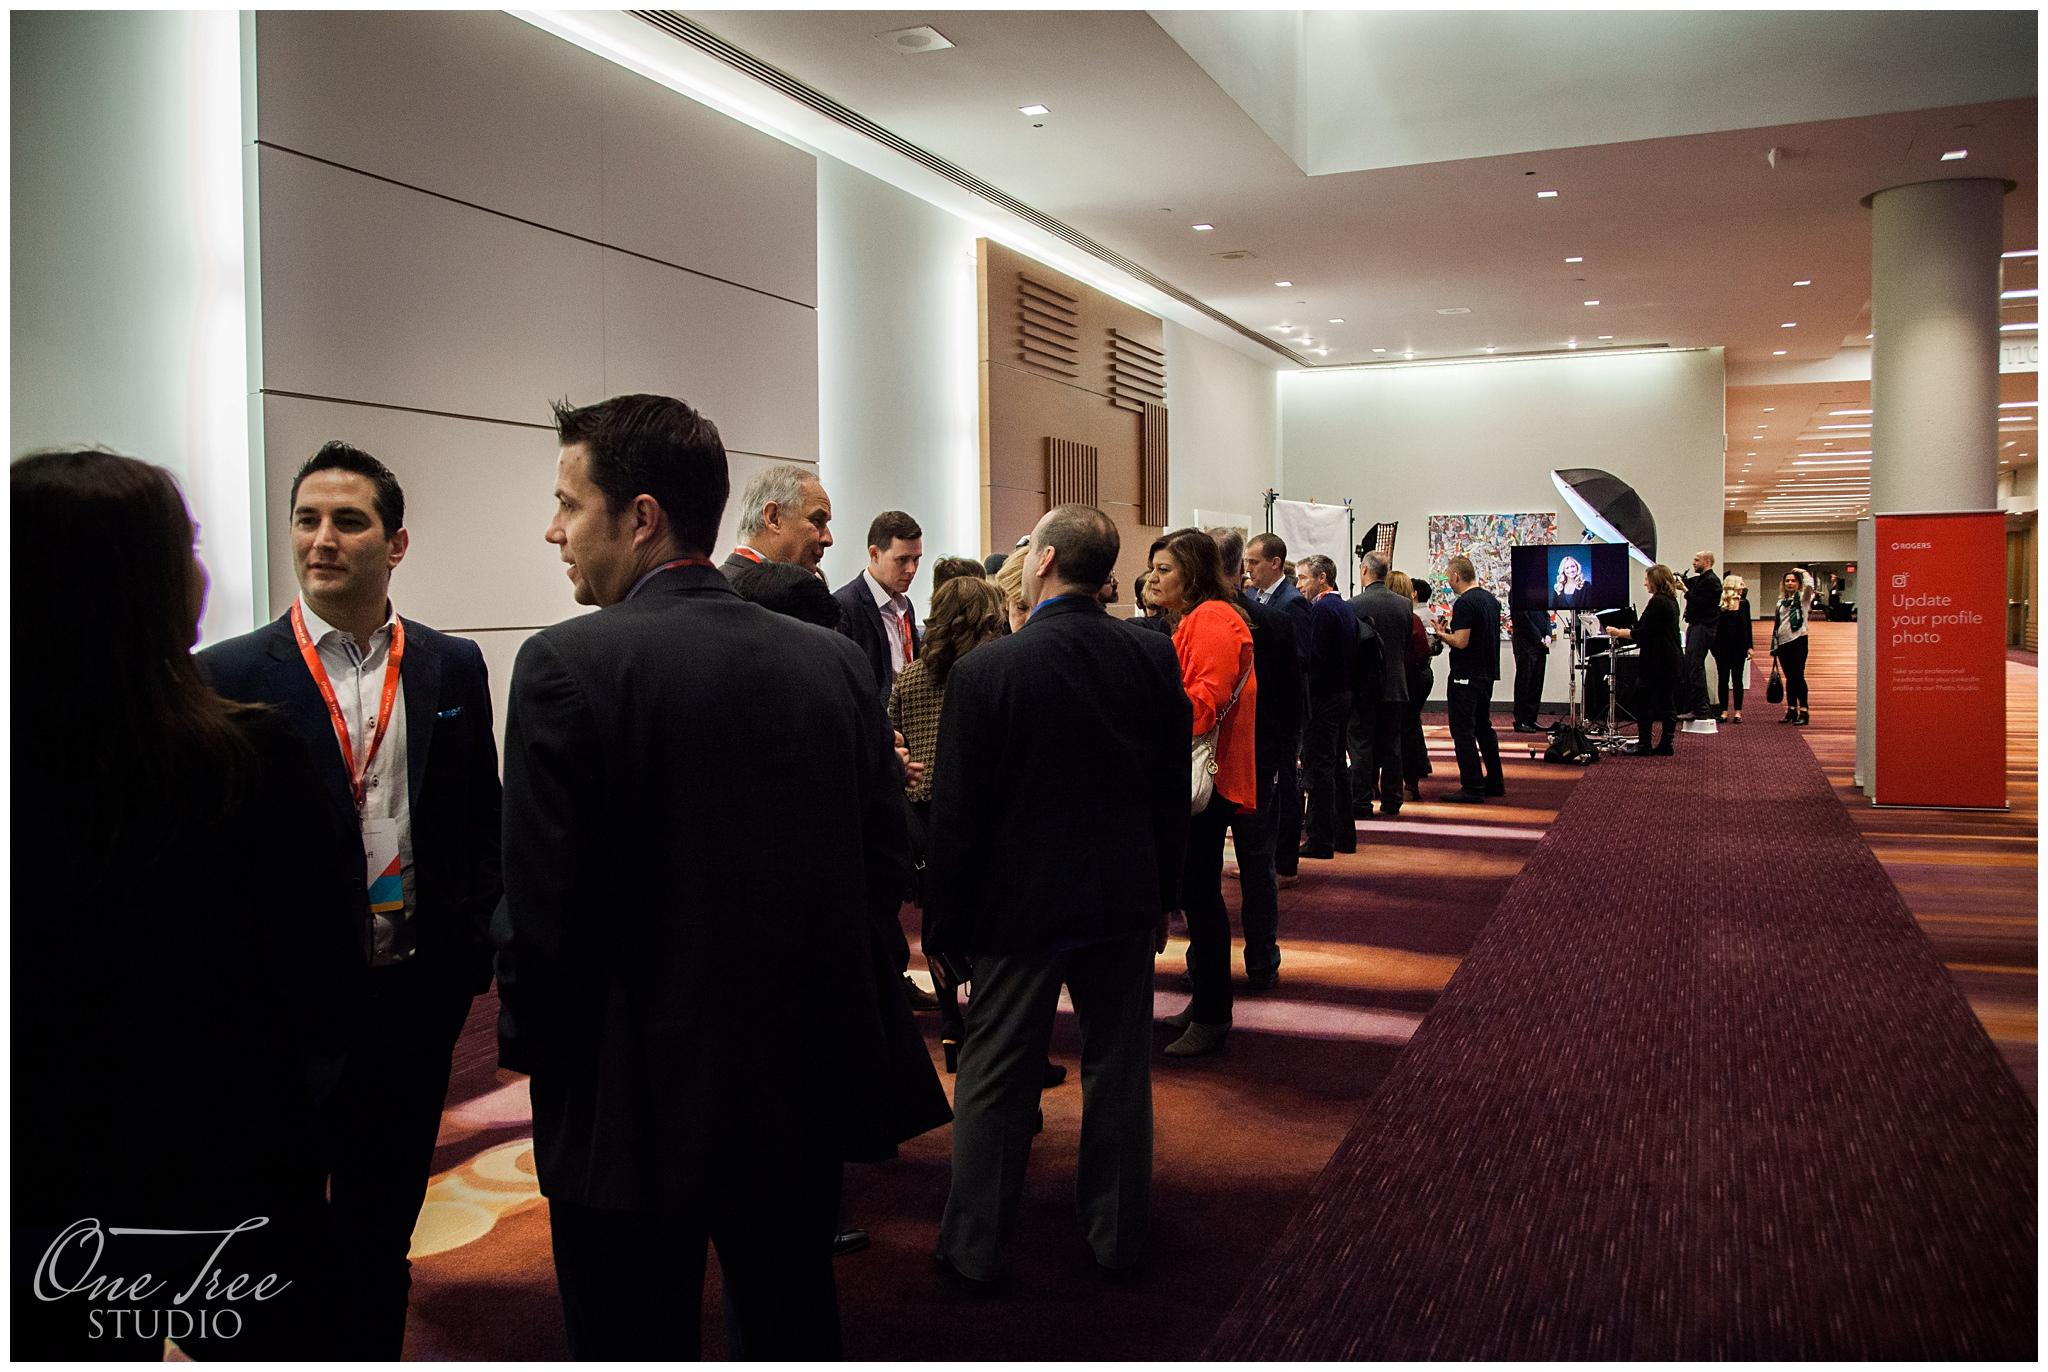 Conference Tradeshow Headshots